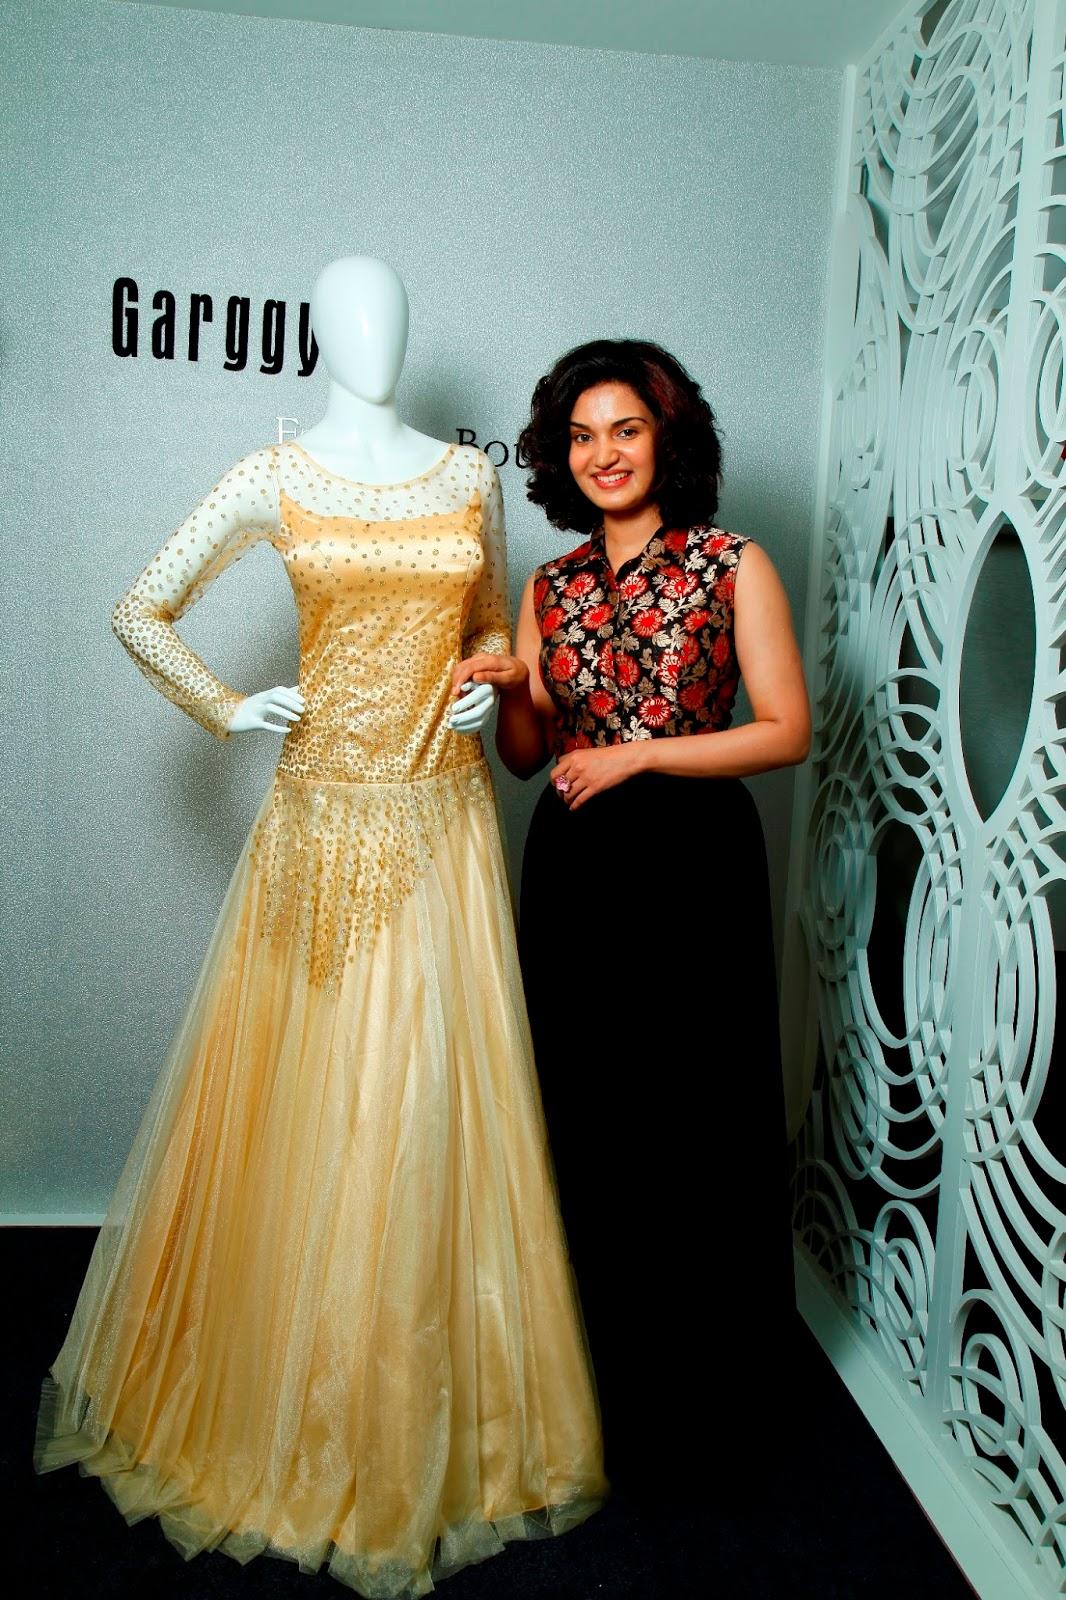 Designer Christian Wedding Gown | Garggy Fascino Boutique